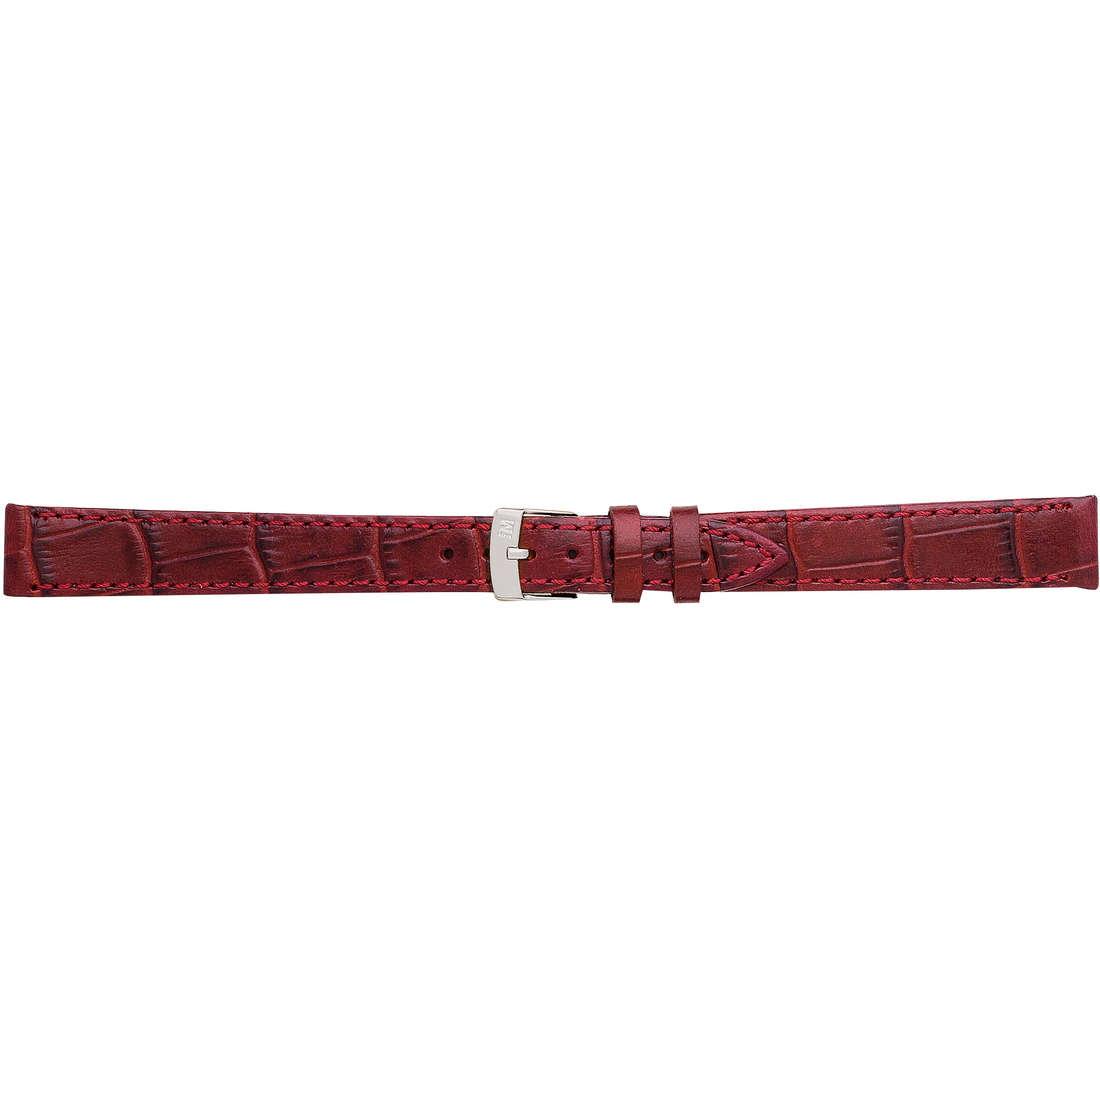 montre bande de montres unisex Morellato I Lunghi A01Y2524656081CR20